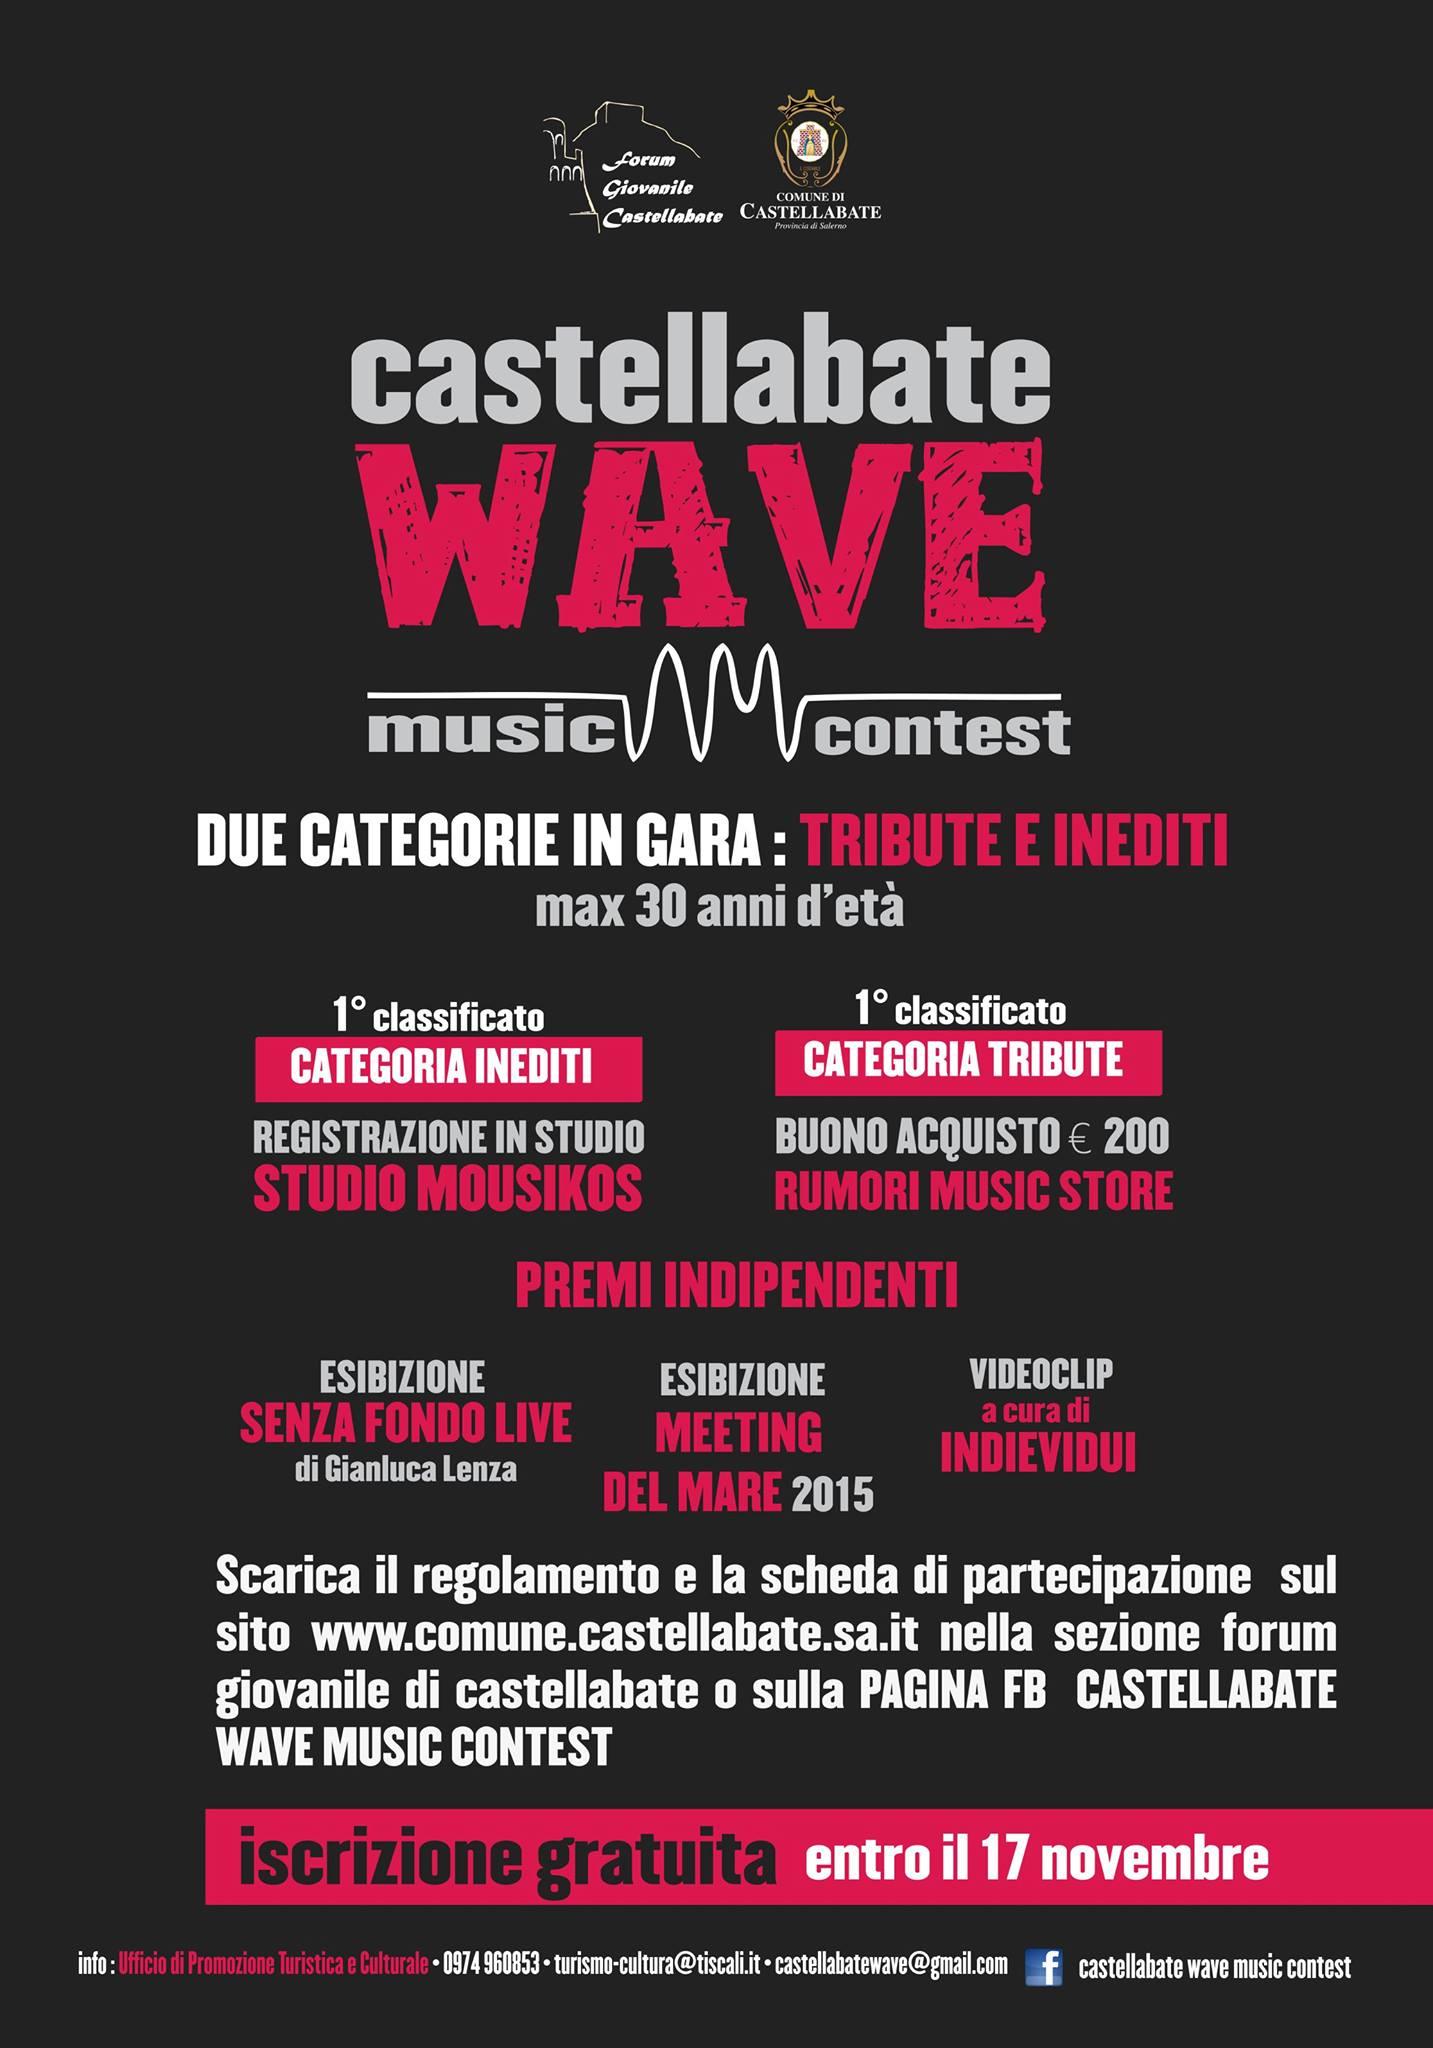 Castellabate Wave music contest